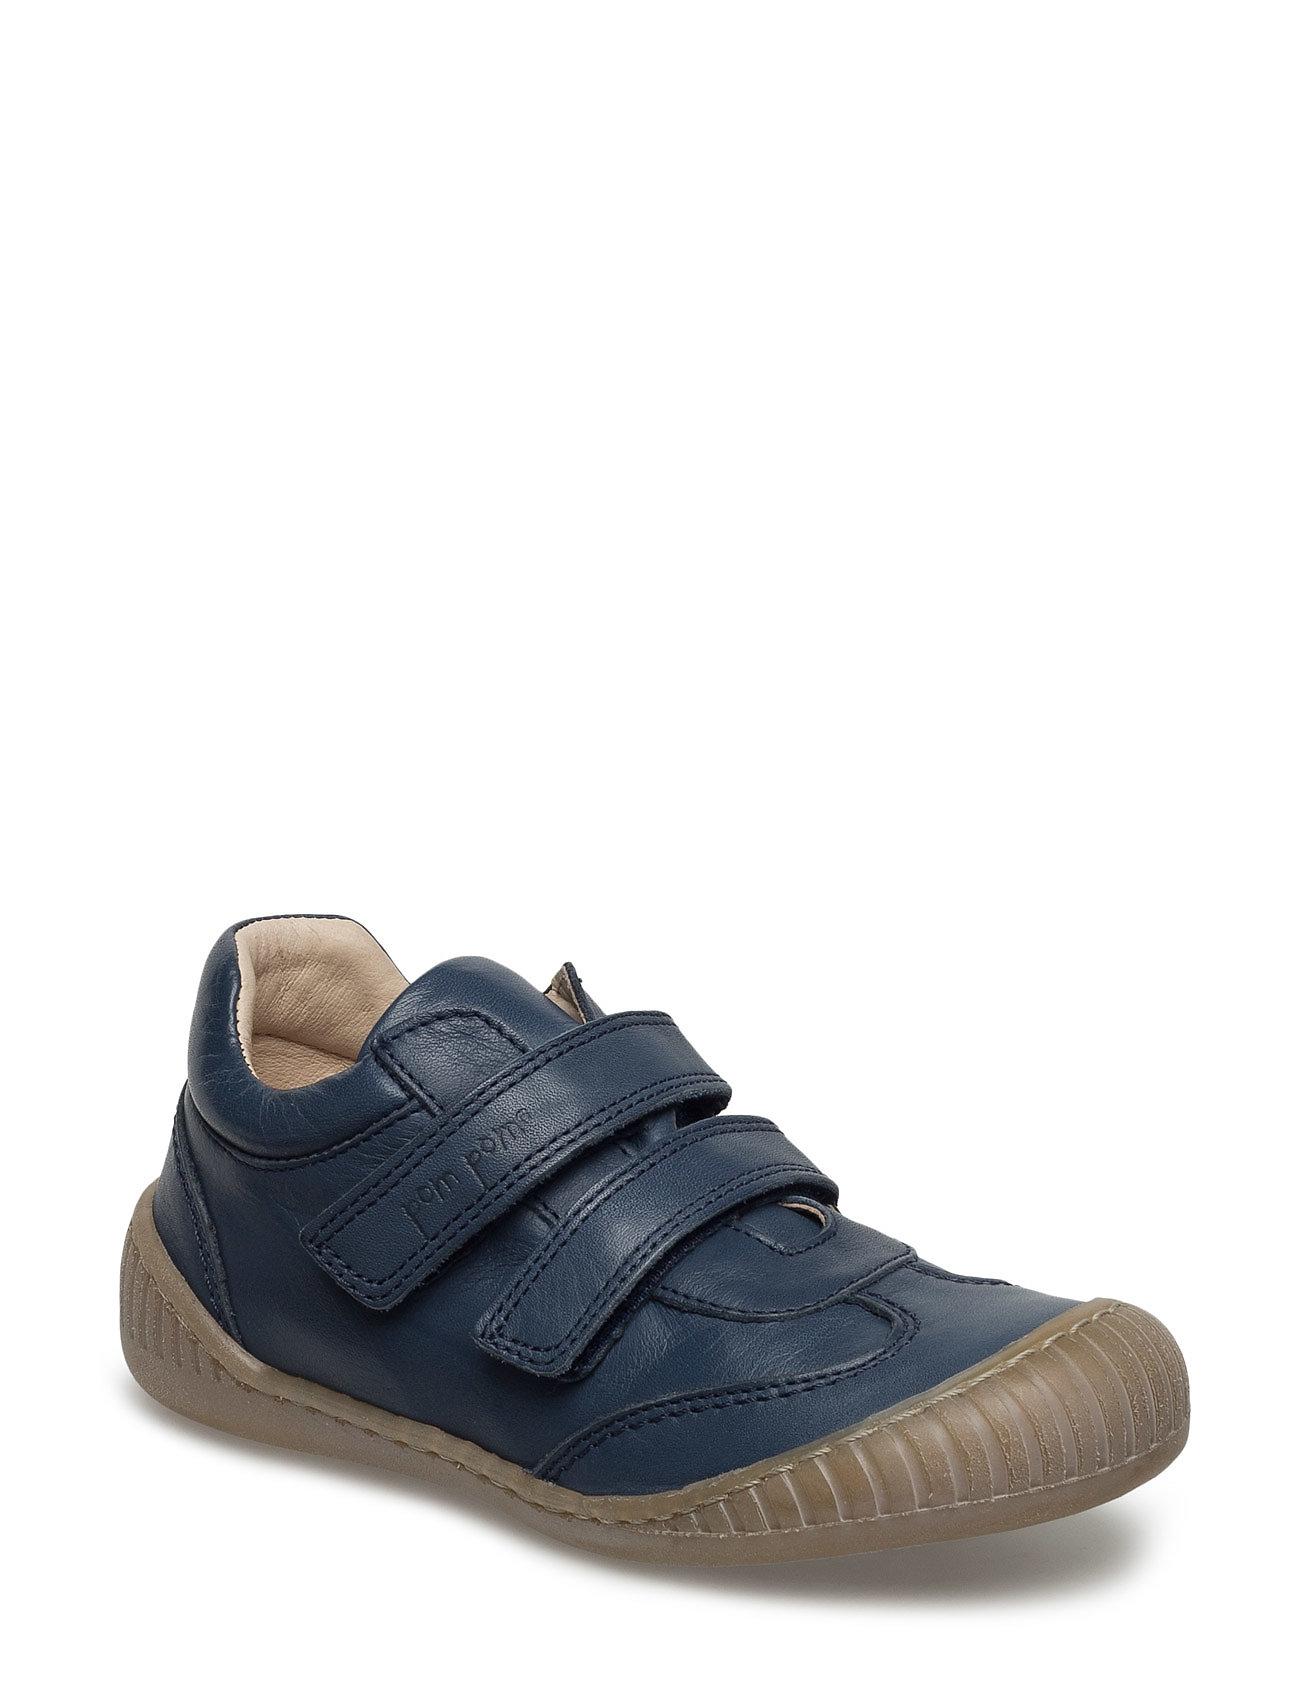 Sneaker Pom pom Sko & Sneakers til Børn i Navy blå